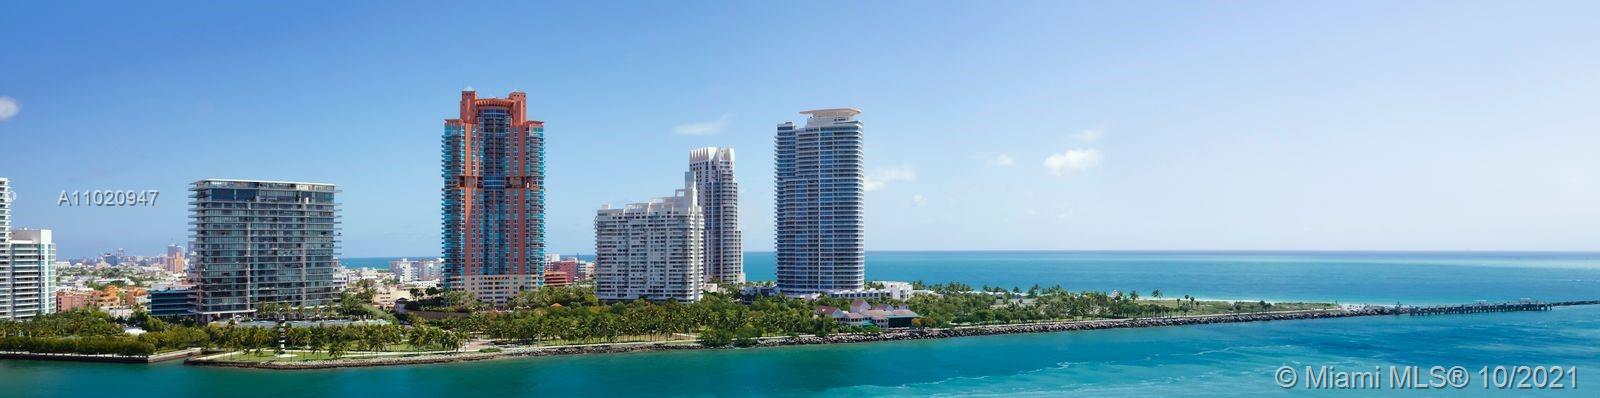 6800 Fisher Island PH 6803, Miami Beach, FL 33109